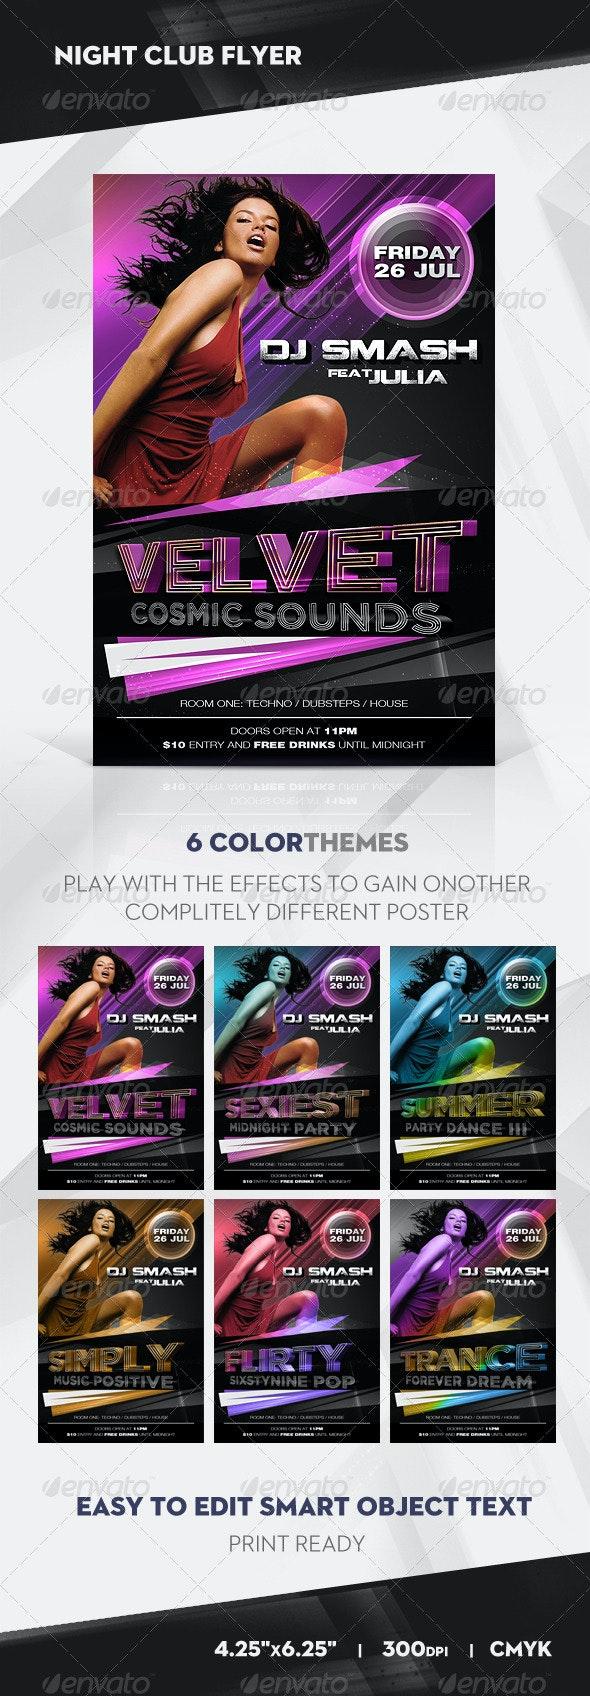 Velvet Sound Dance Party Flyer / Poster - Clubs & Parties Events